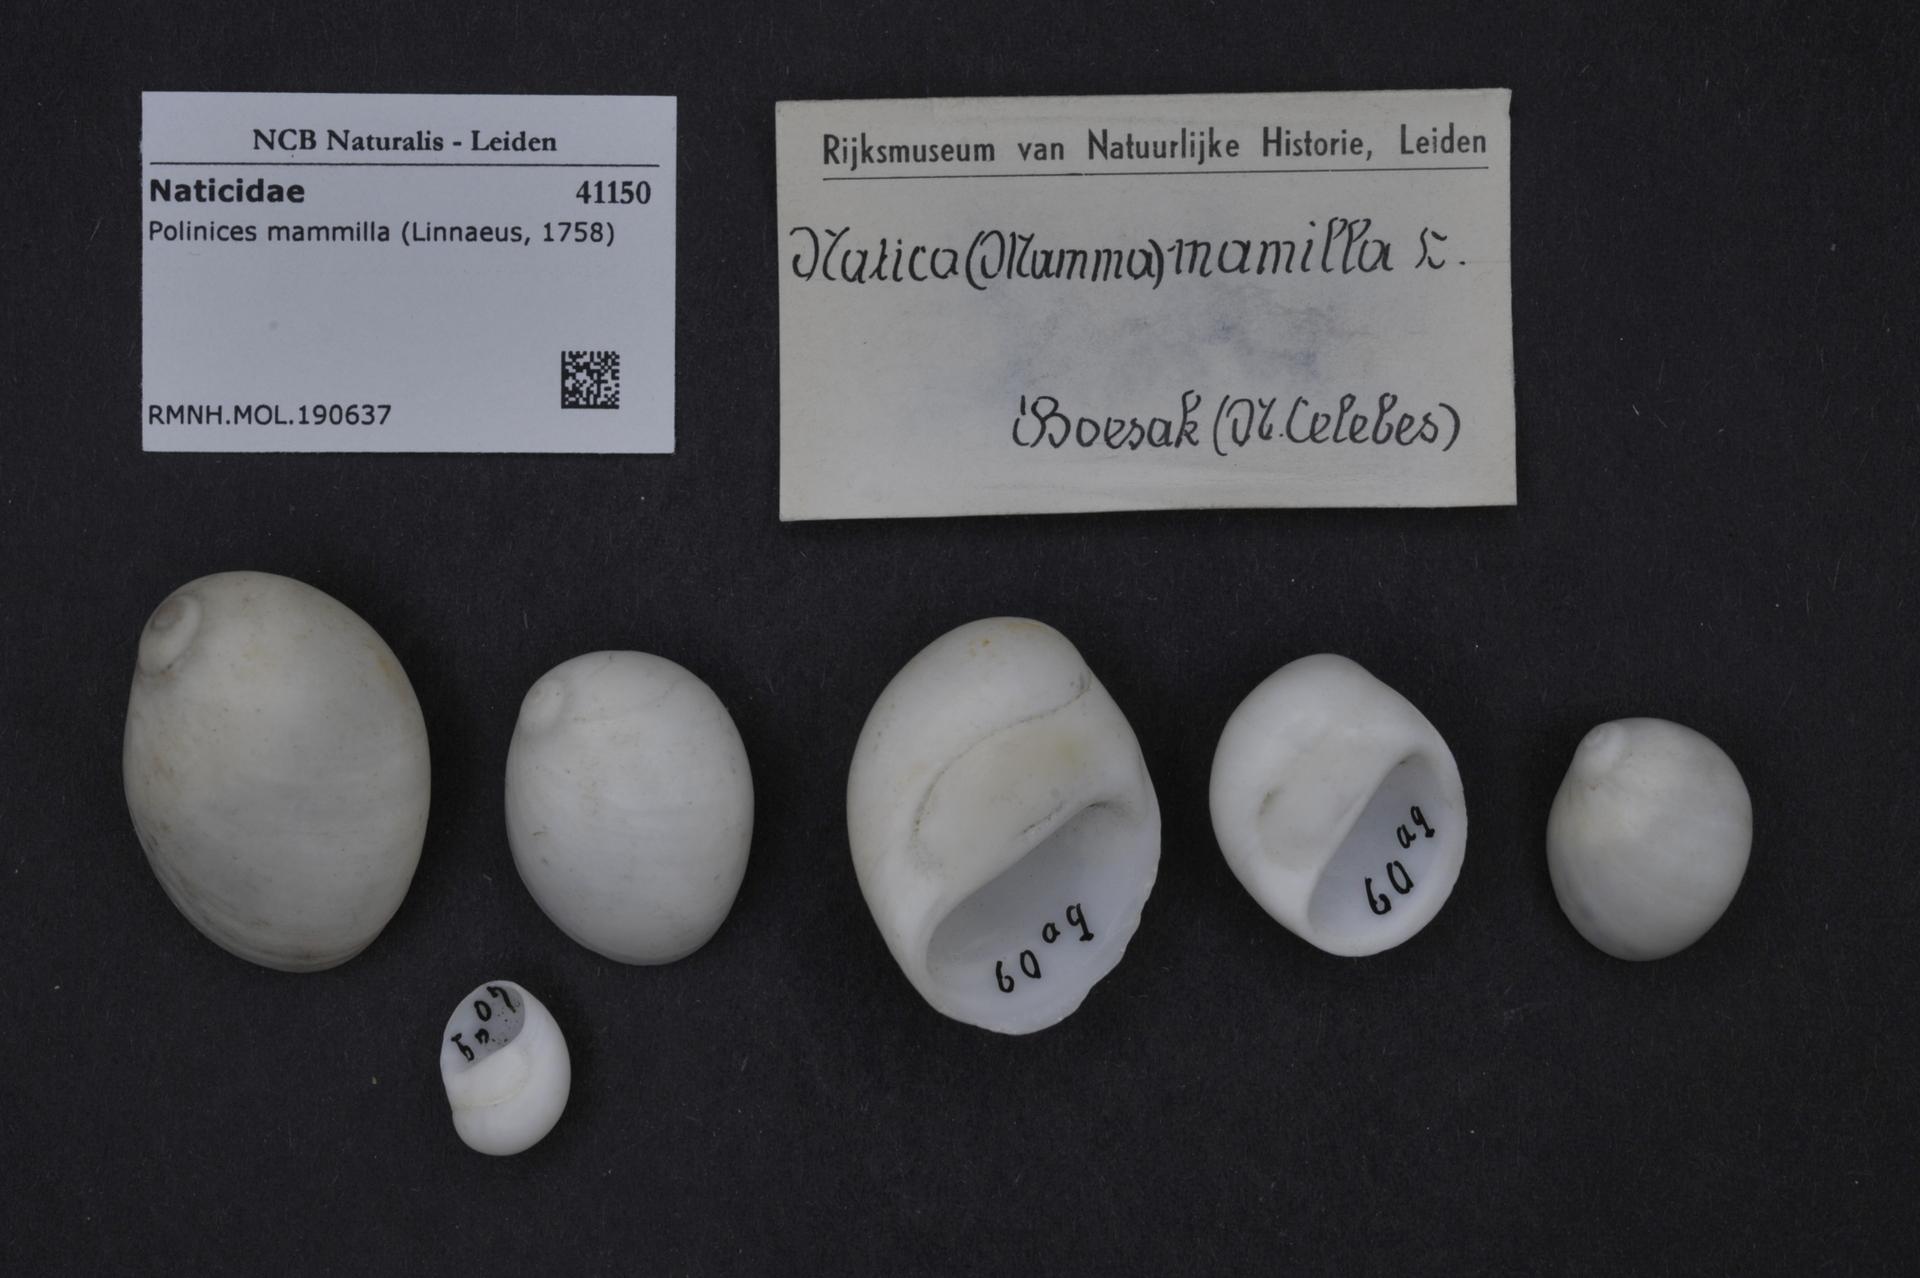 RMNH.MOL.190637 | Polinices mammilla (Linnaeus, 1758)